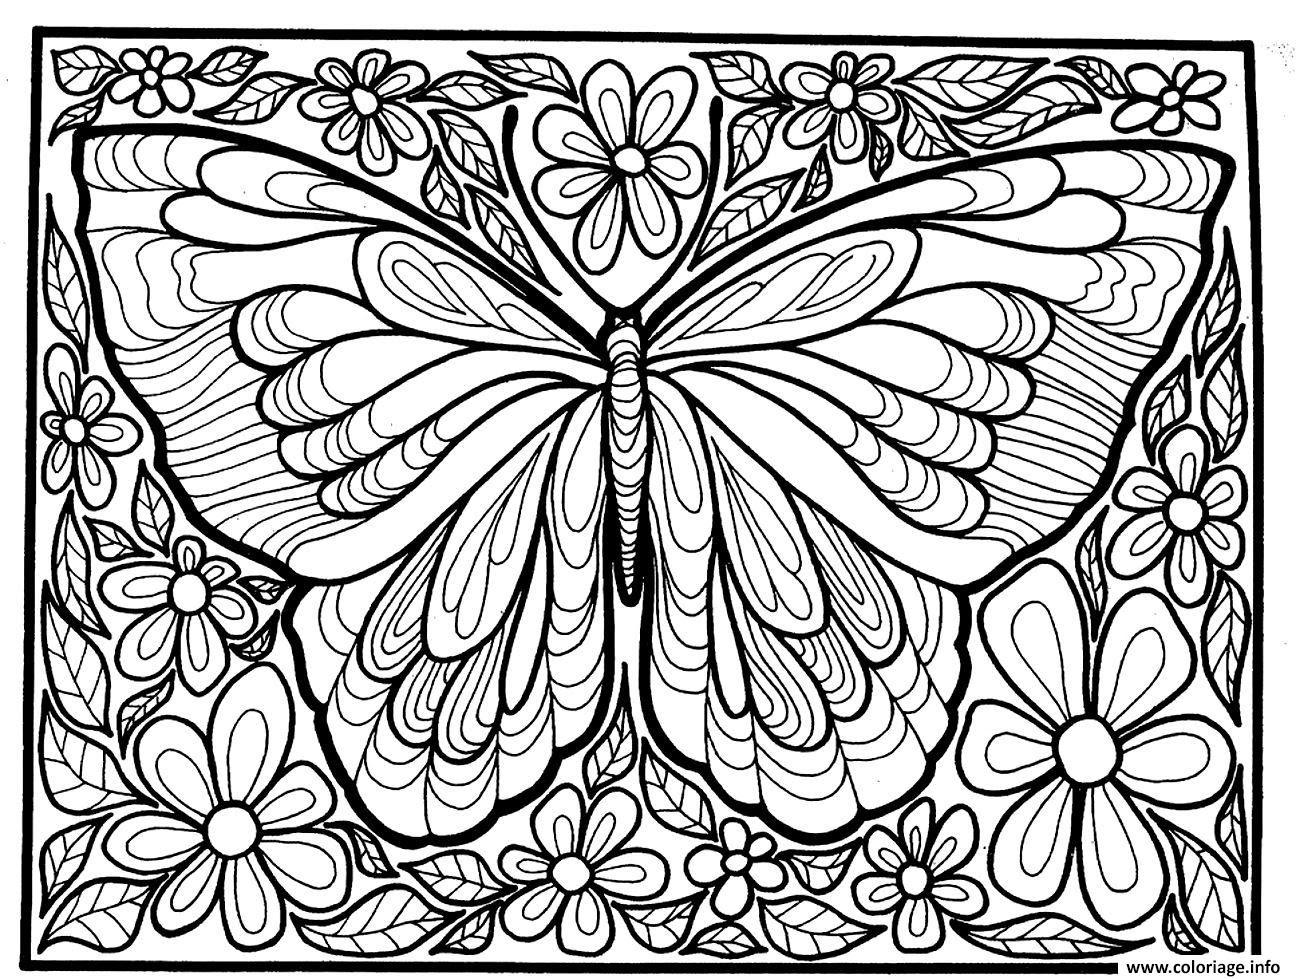 Coloriage Adulte Difficile Grand Papillon Jecoloriecom